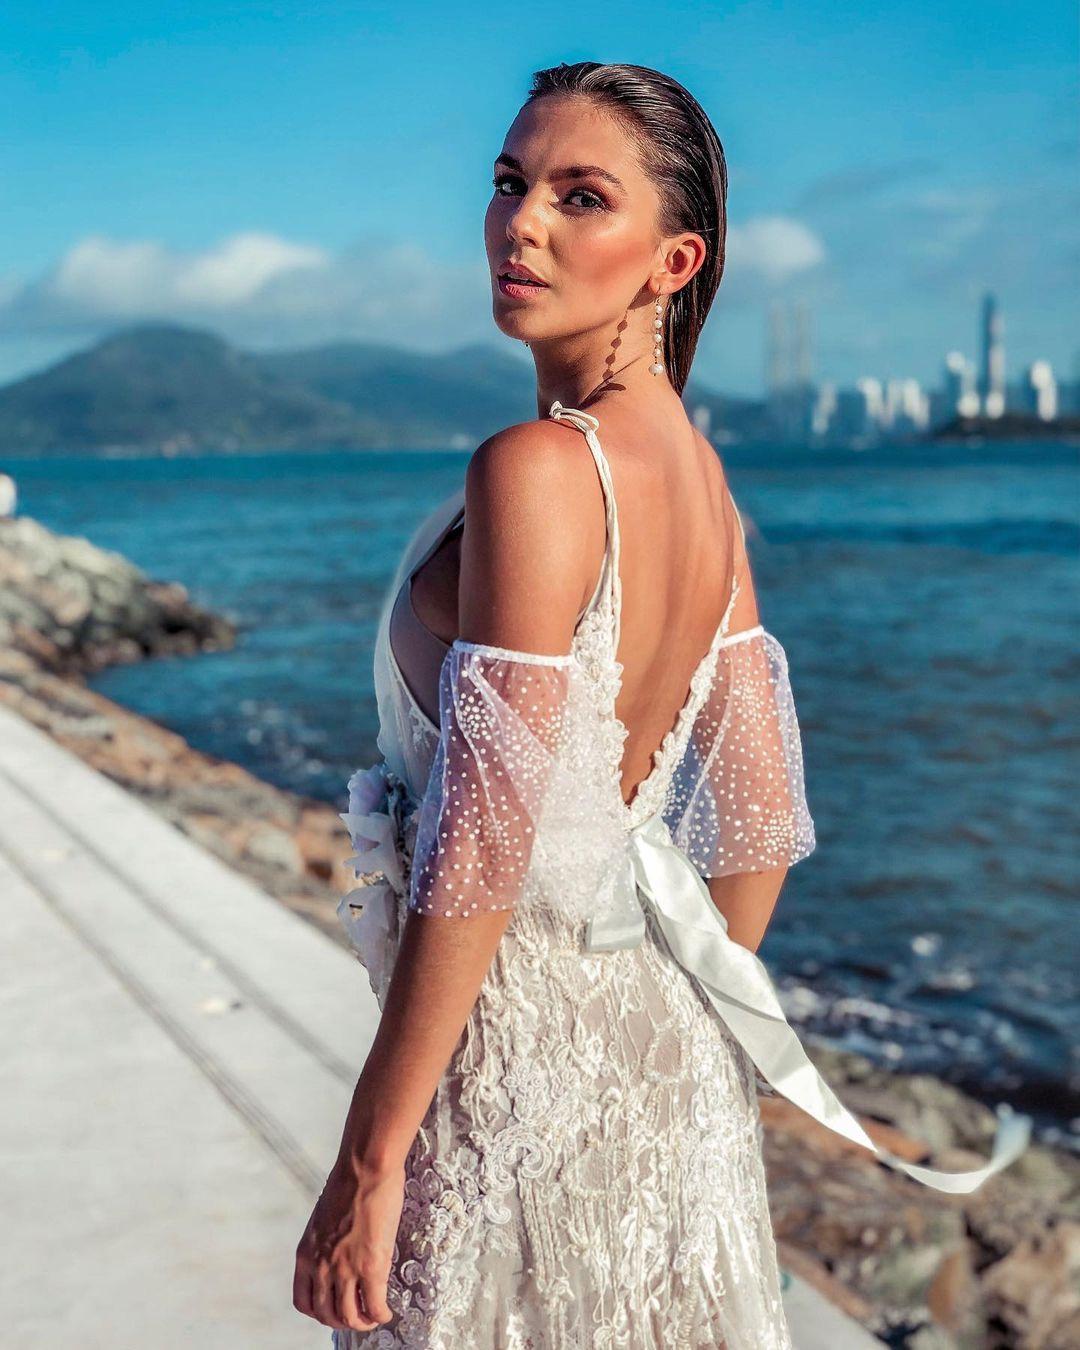 ana flavia giacomini, miss ilha dos lobos mundo 2019. - Página 2 Fvoqhq10